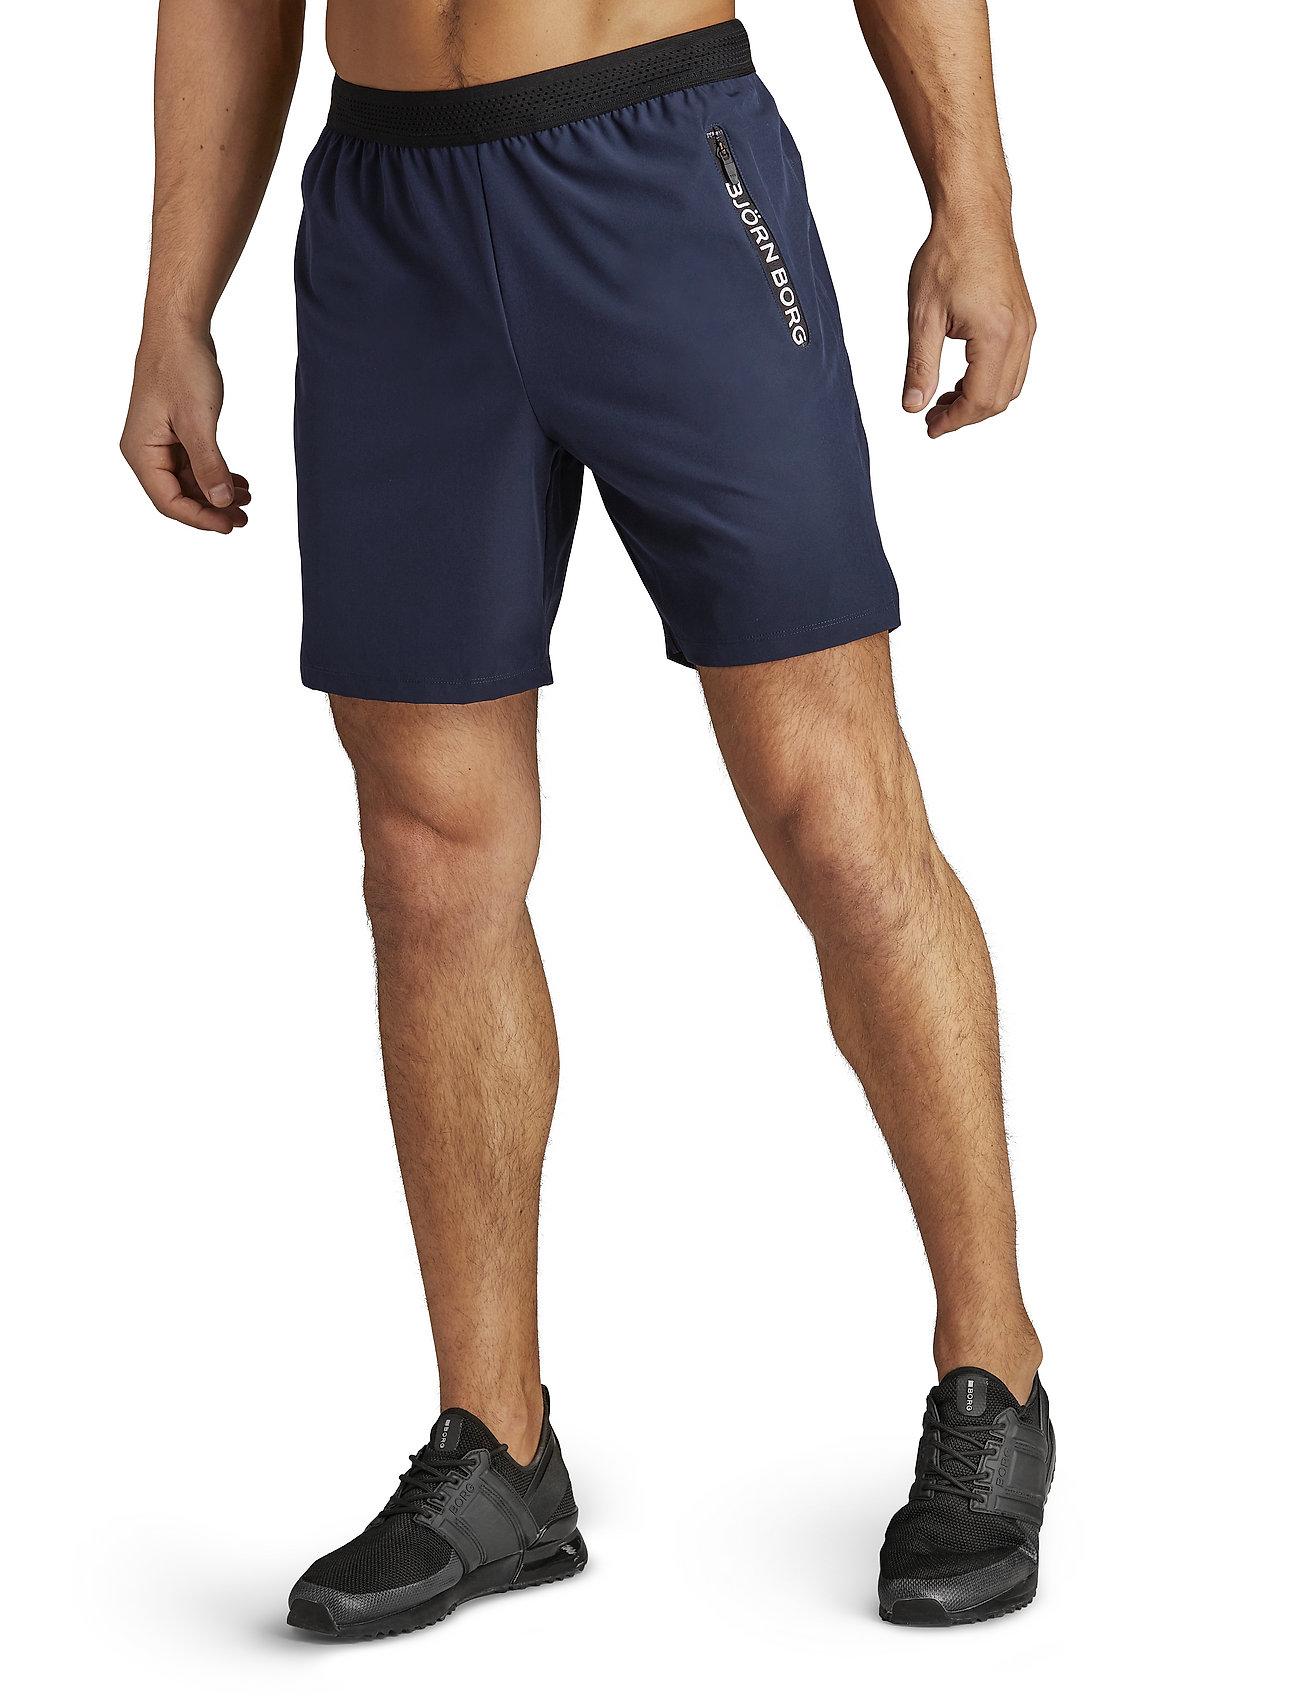 Björn Borg - ADILS SHORTS - training shorts - peacoat